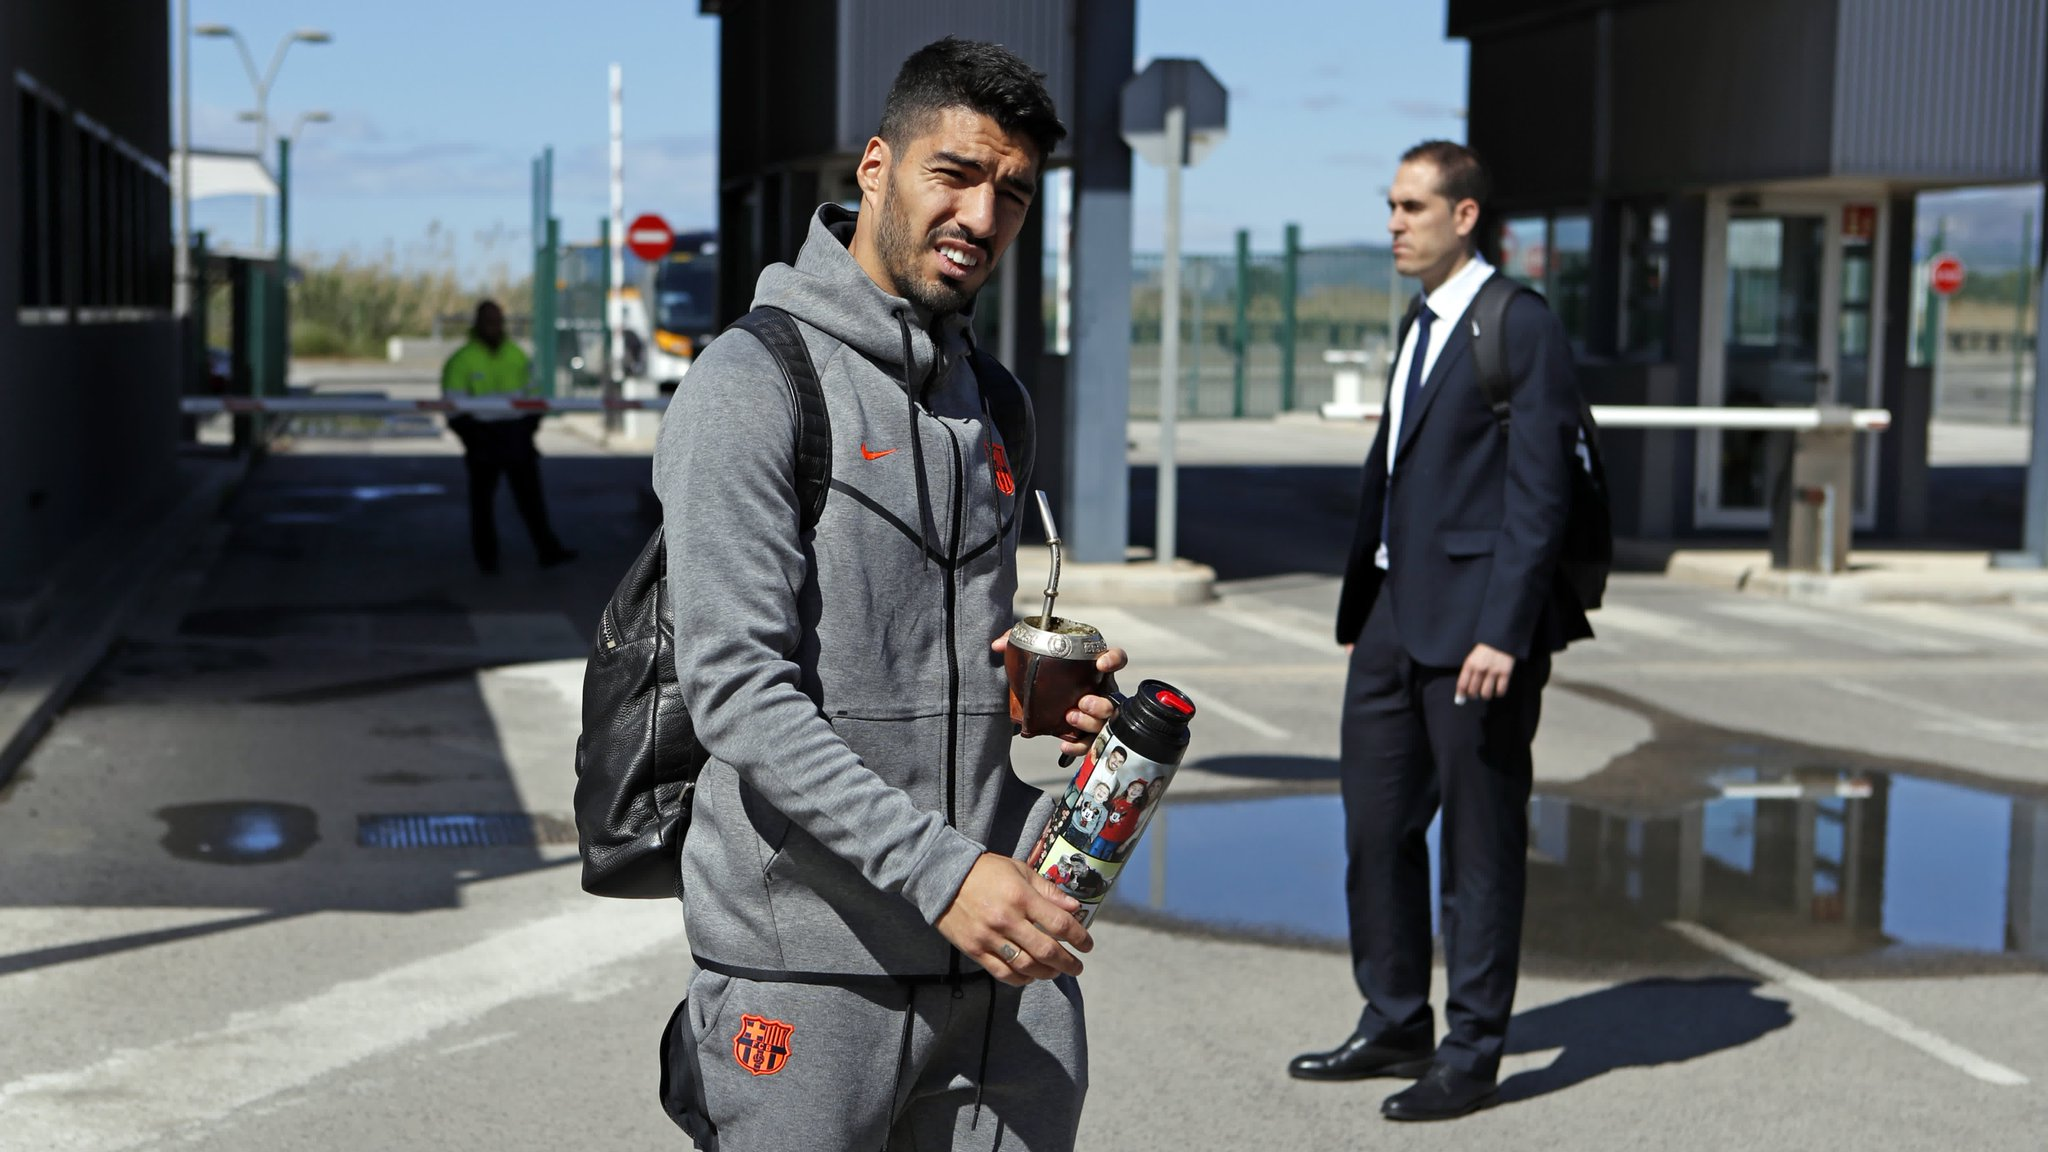 �� Valencia #LevanteBarça https://t.co/gxXVpw5ZJC